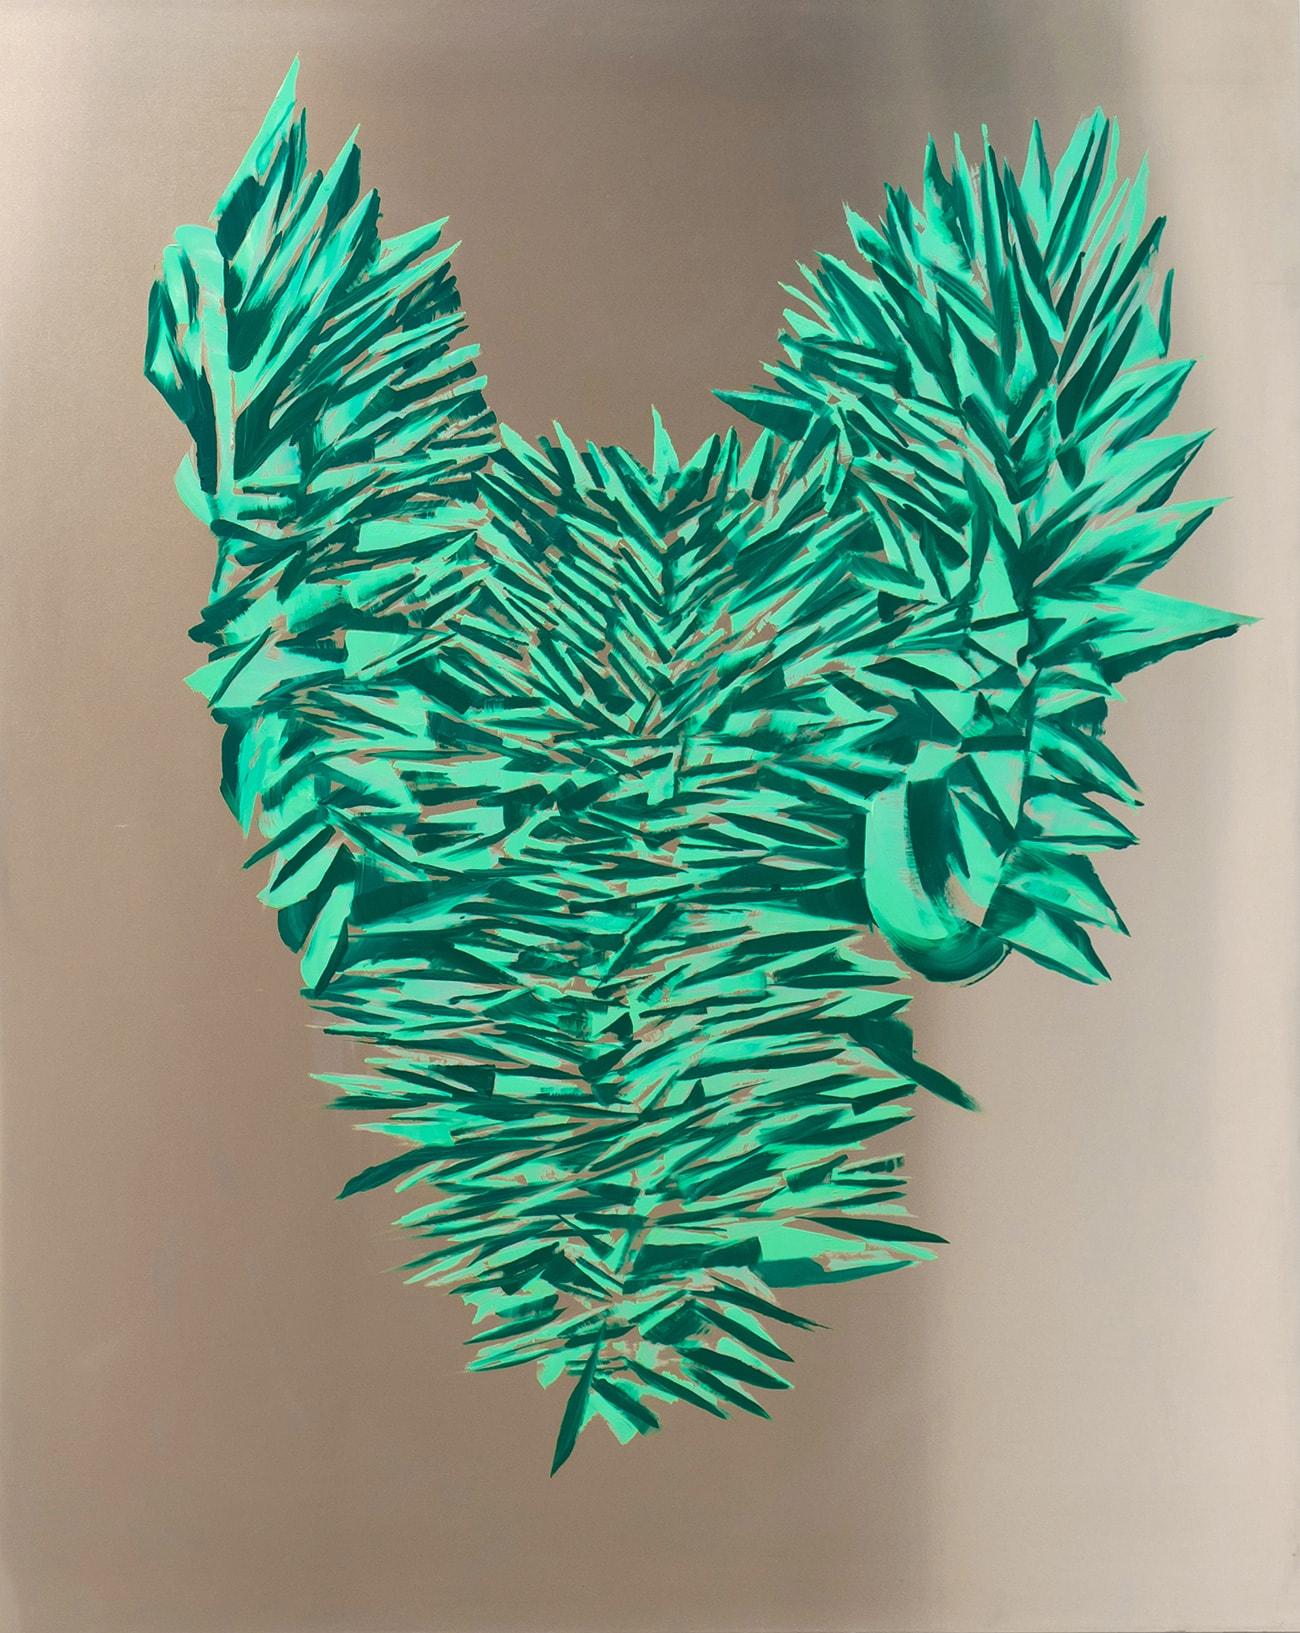 Green armor - Isabel Gómez Liebre